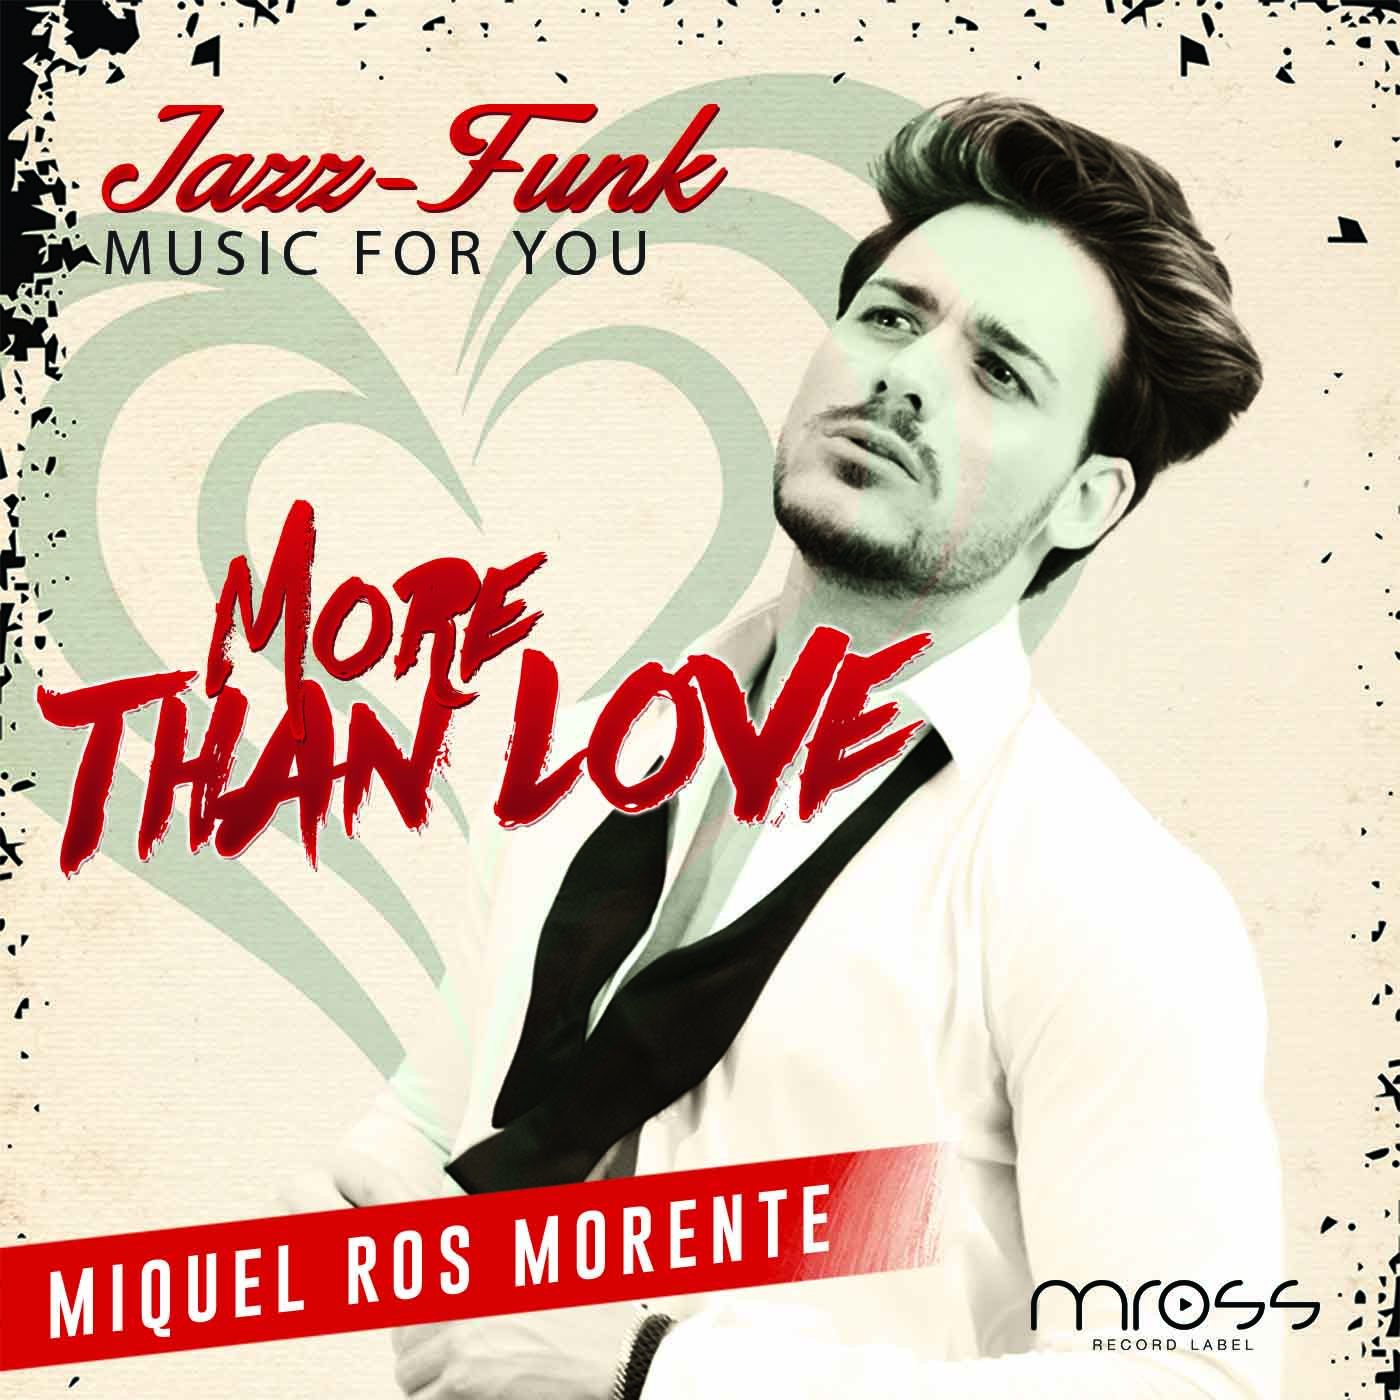 More than love - Miquel Ros Morente - Caratula